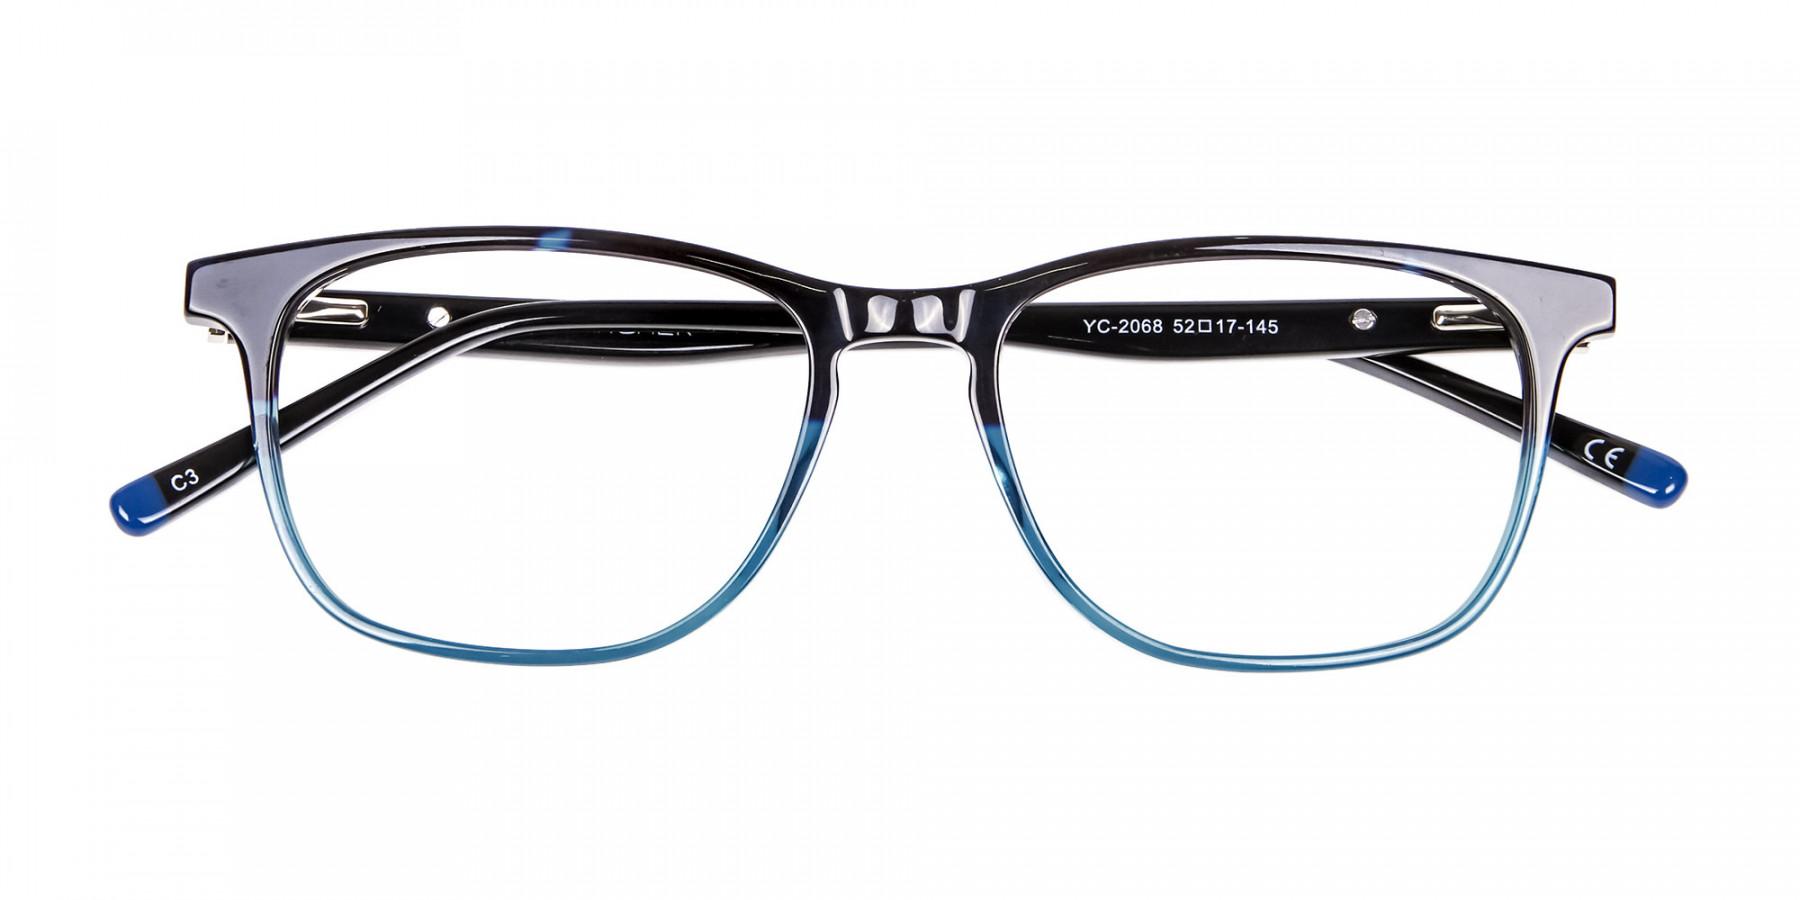 Colour Mixed Nerd Look Rectangular Glasses - 1